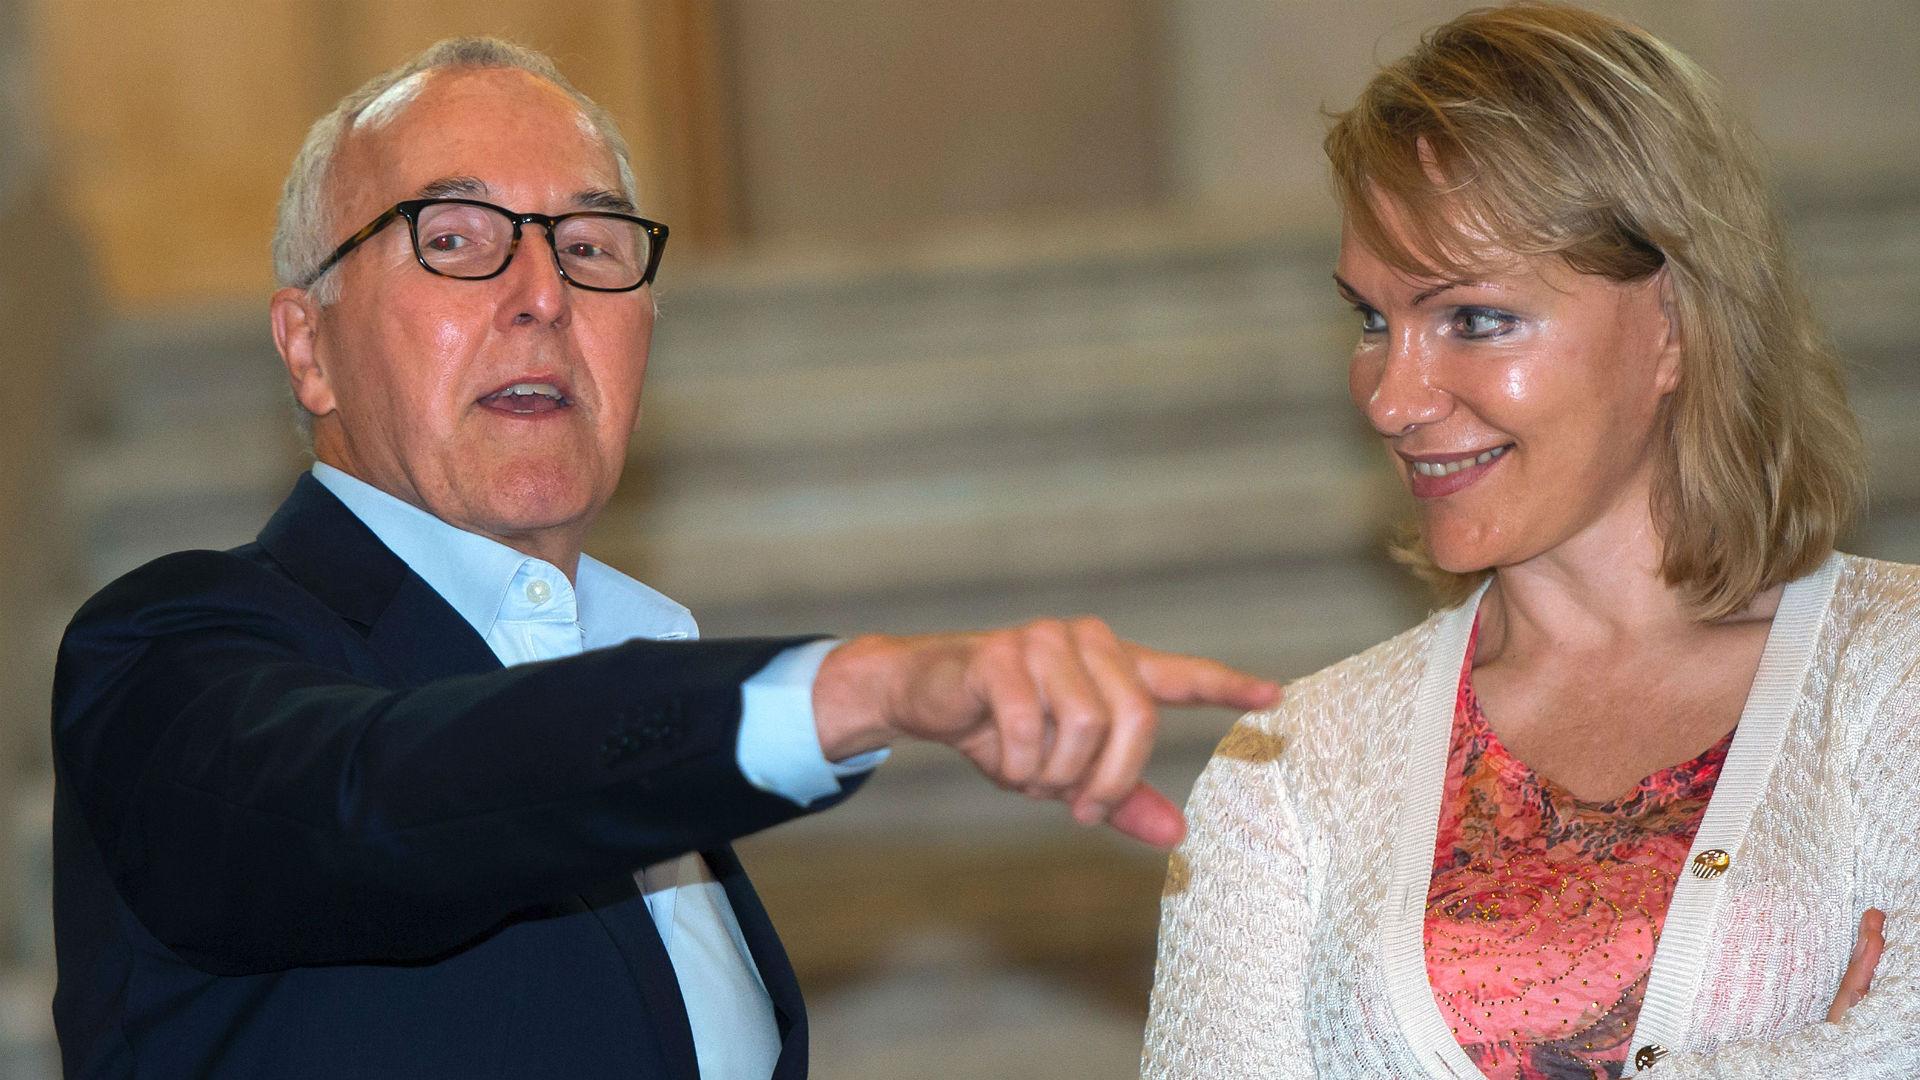 Franck McCourt Margarita Louis-Dreyfus Marseille